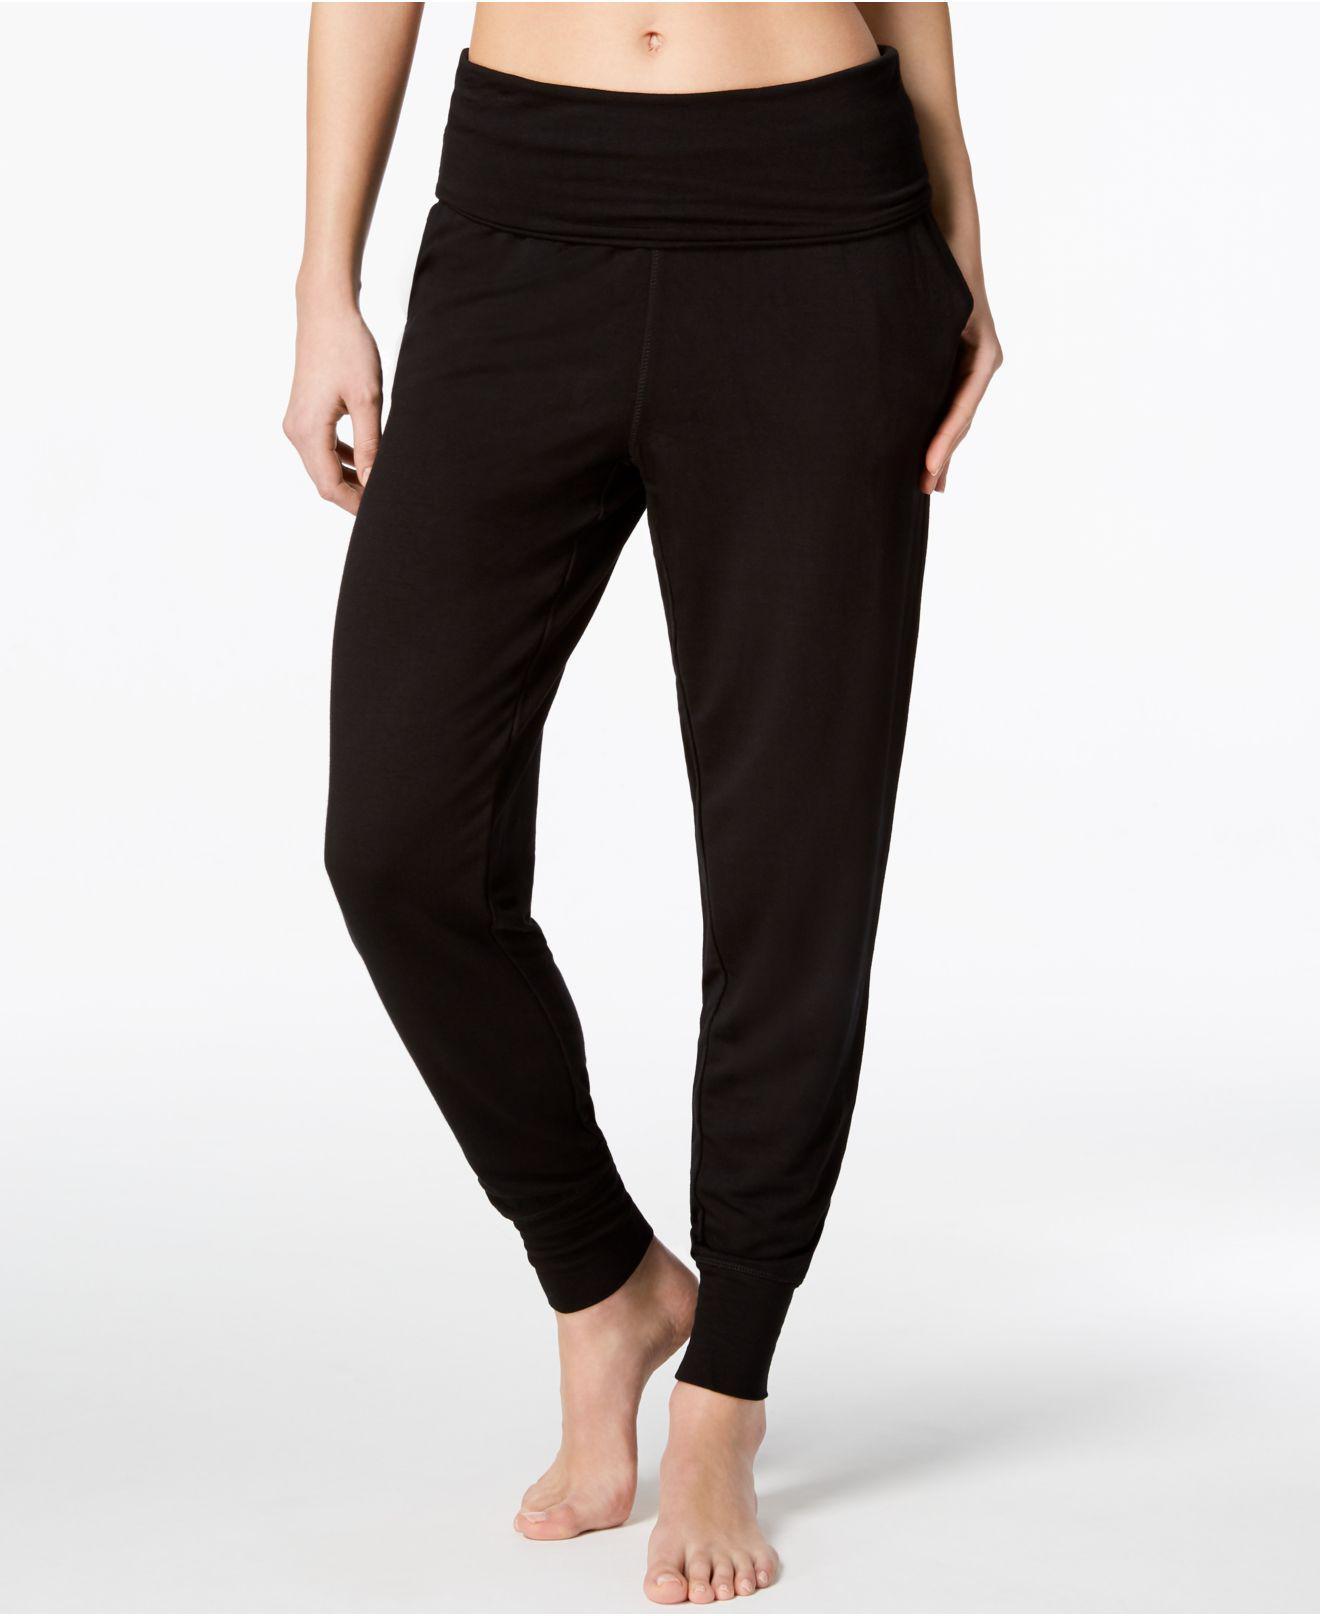 80c6fb76ac19b Gaiam Piper Harem Pants in Black - Lyst